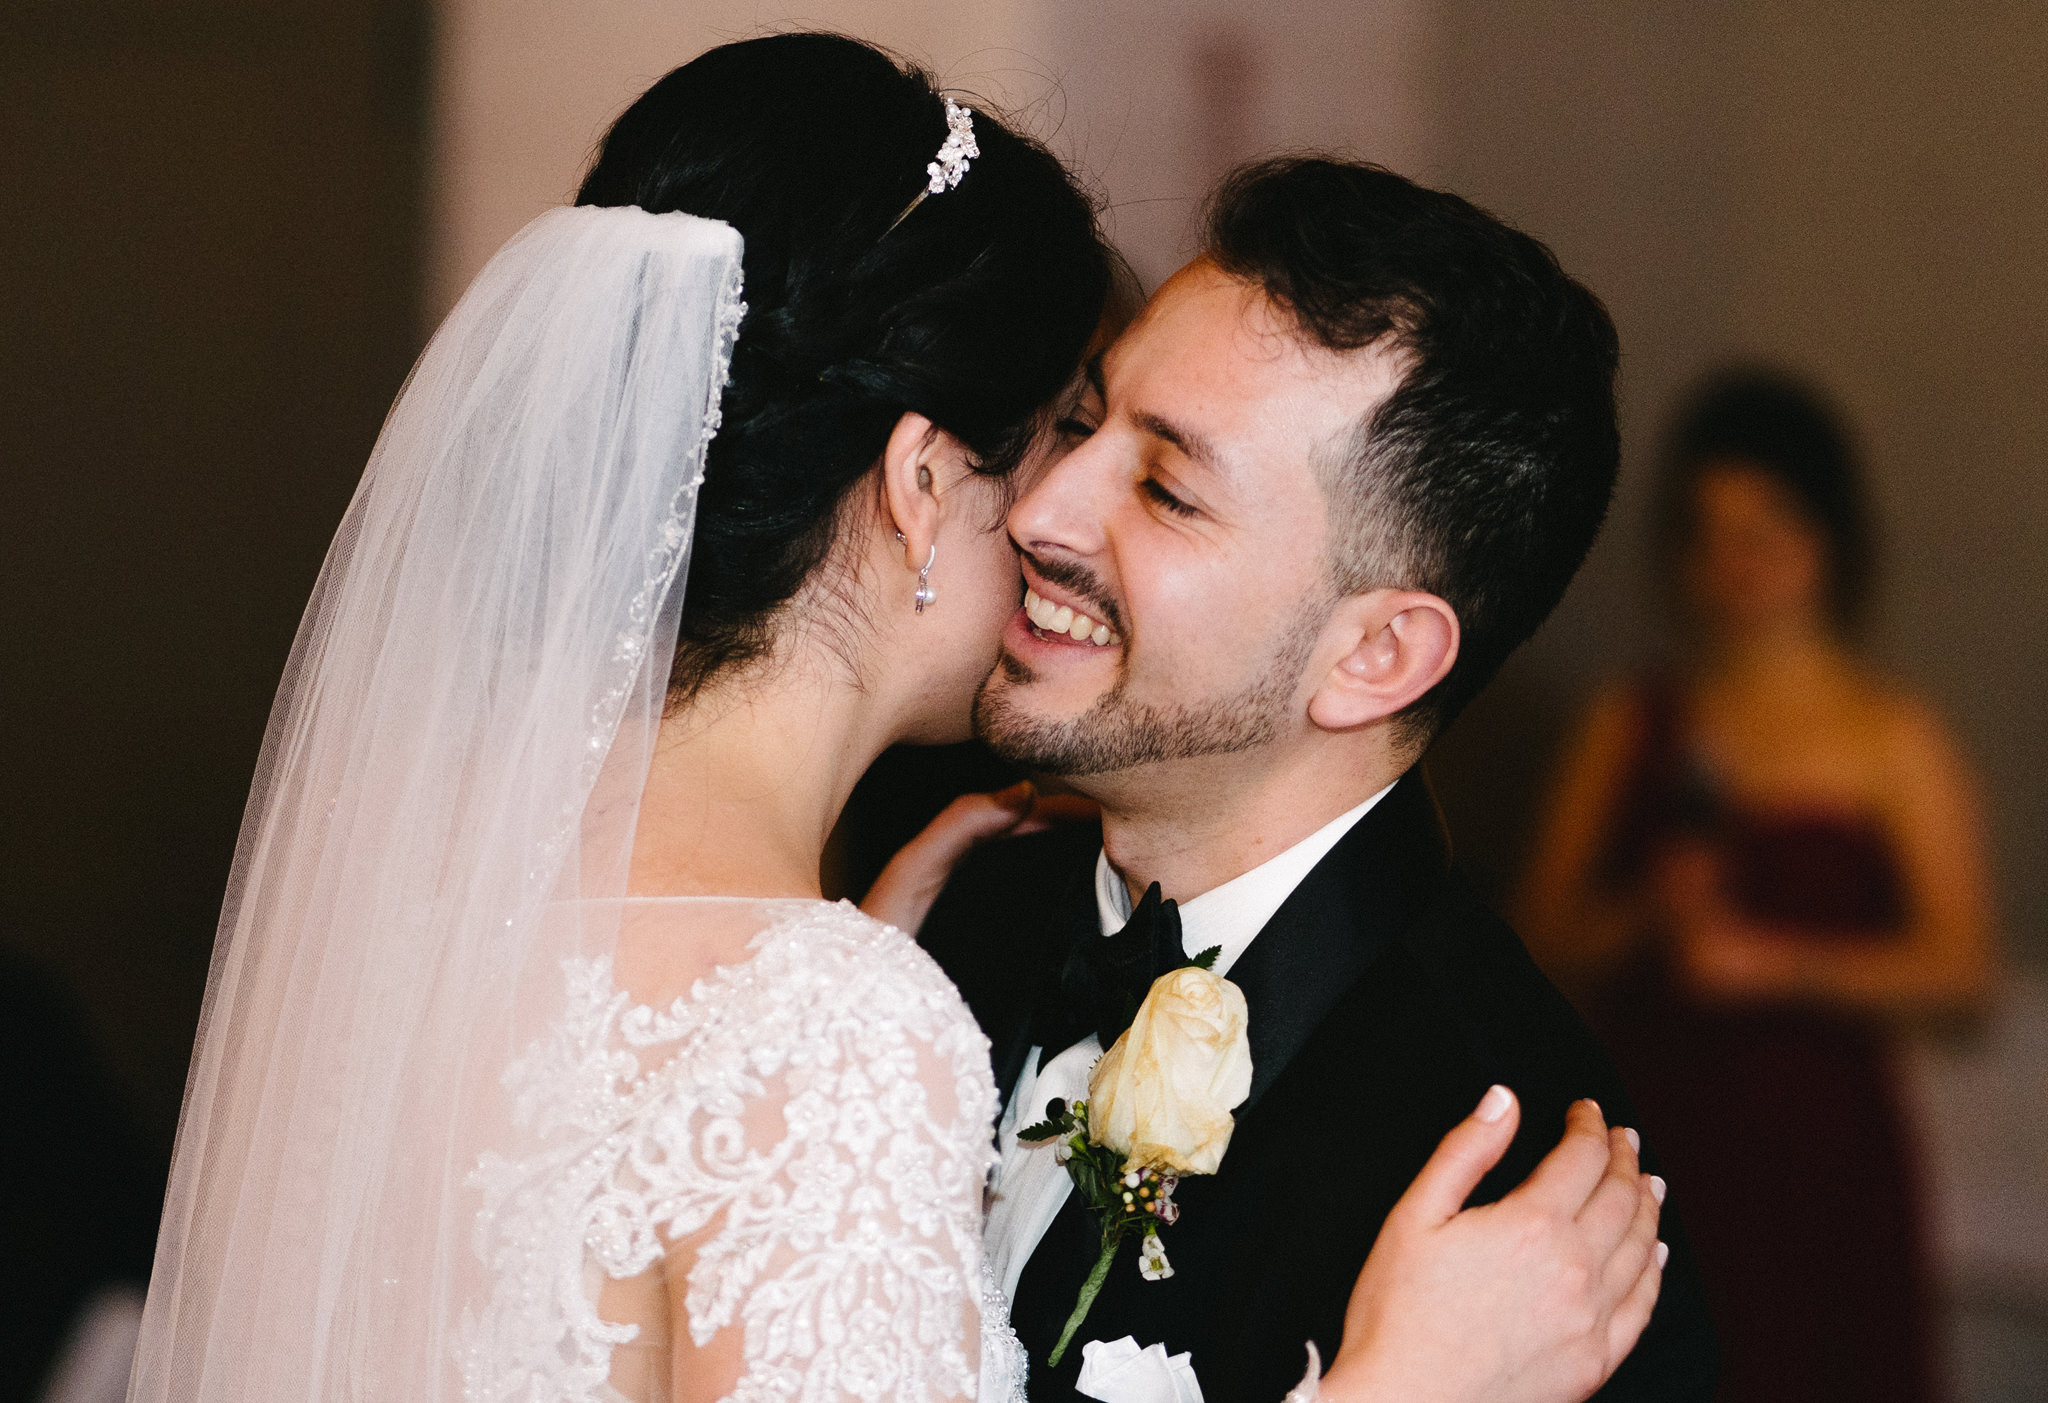 044-rempel-photography-chicago-wedding-inspiration-susan-daniel-michigan-metro-detroit-christian-church-holly-vault-cupcakes-and-kisses.jpg